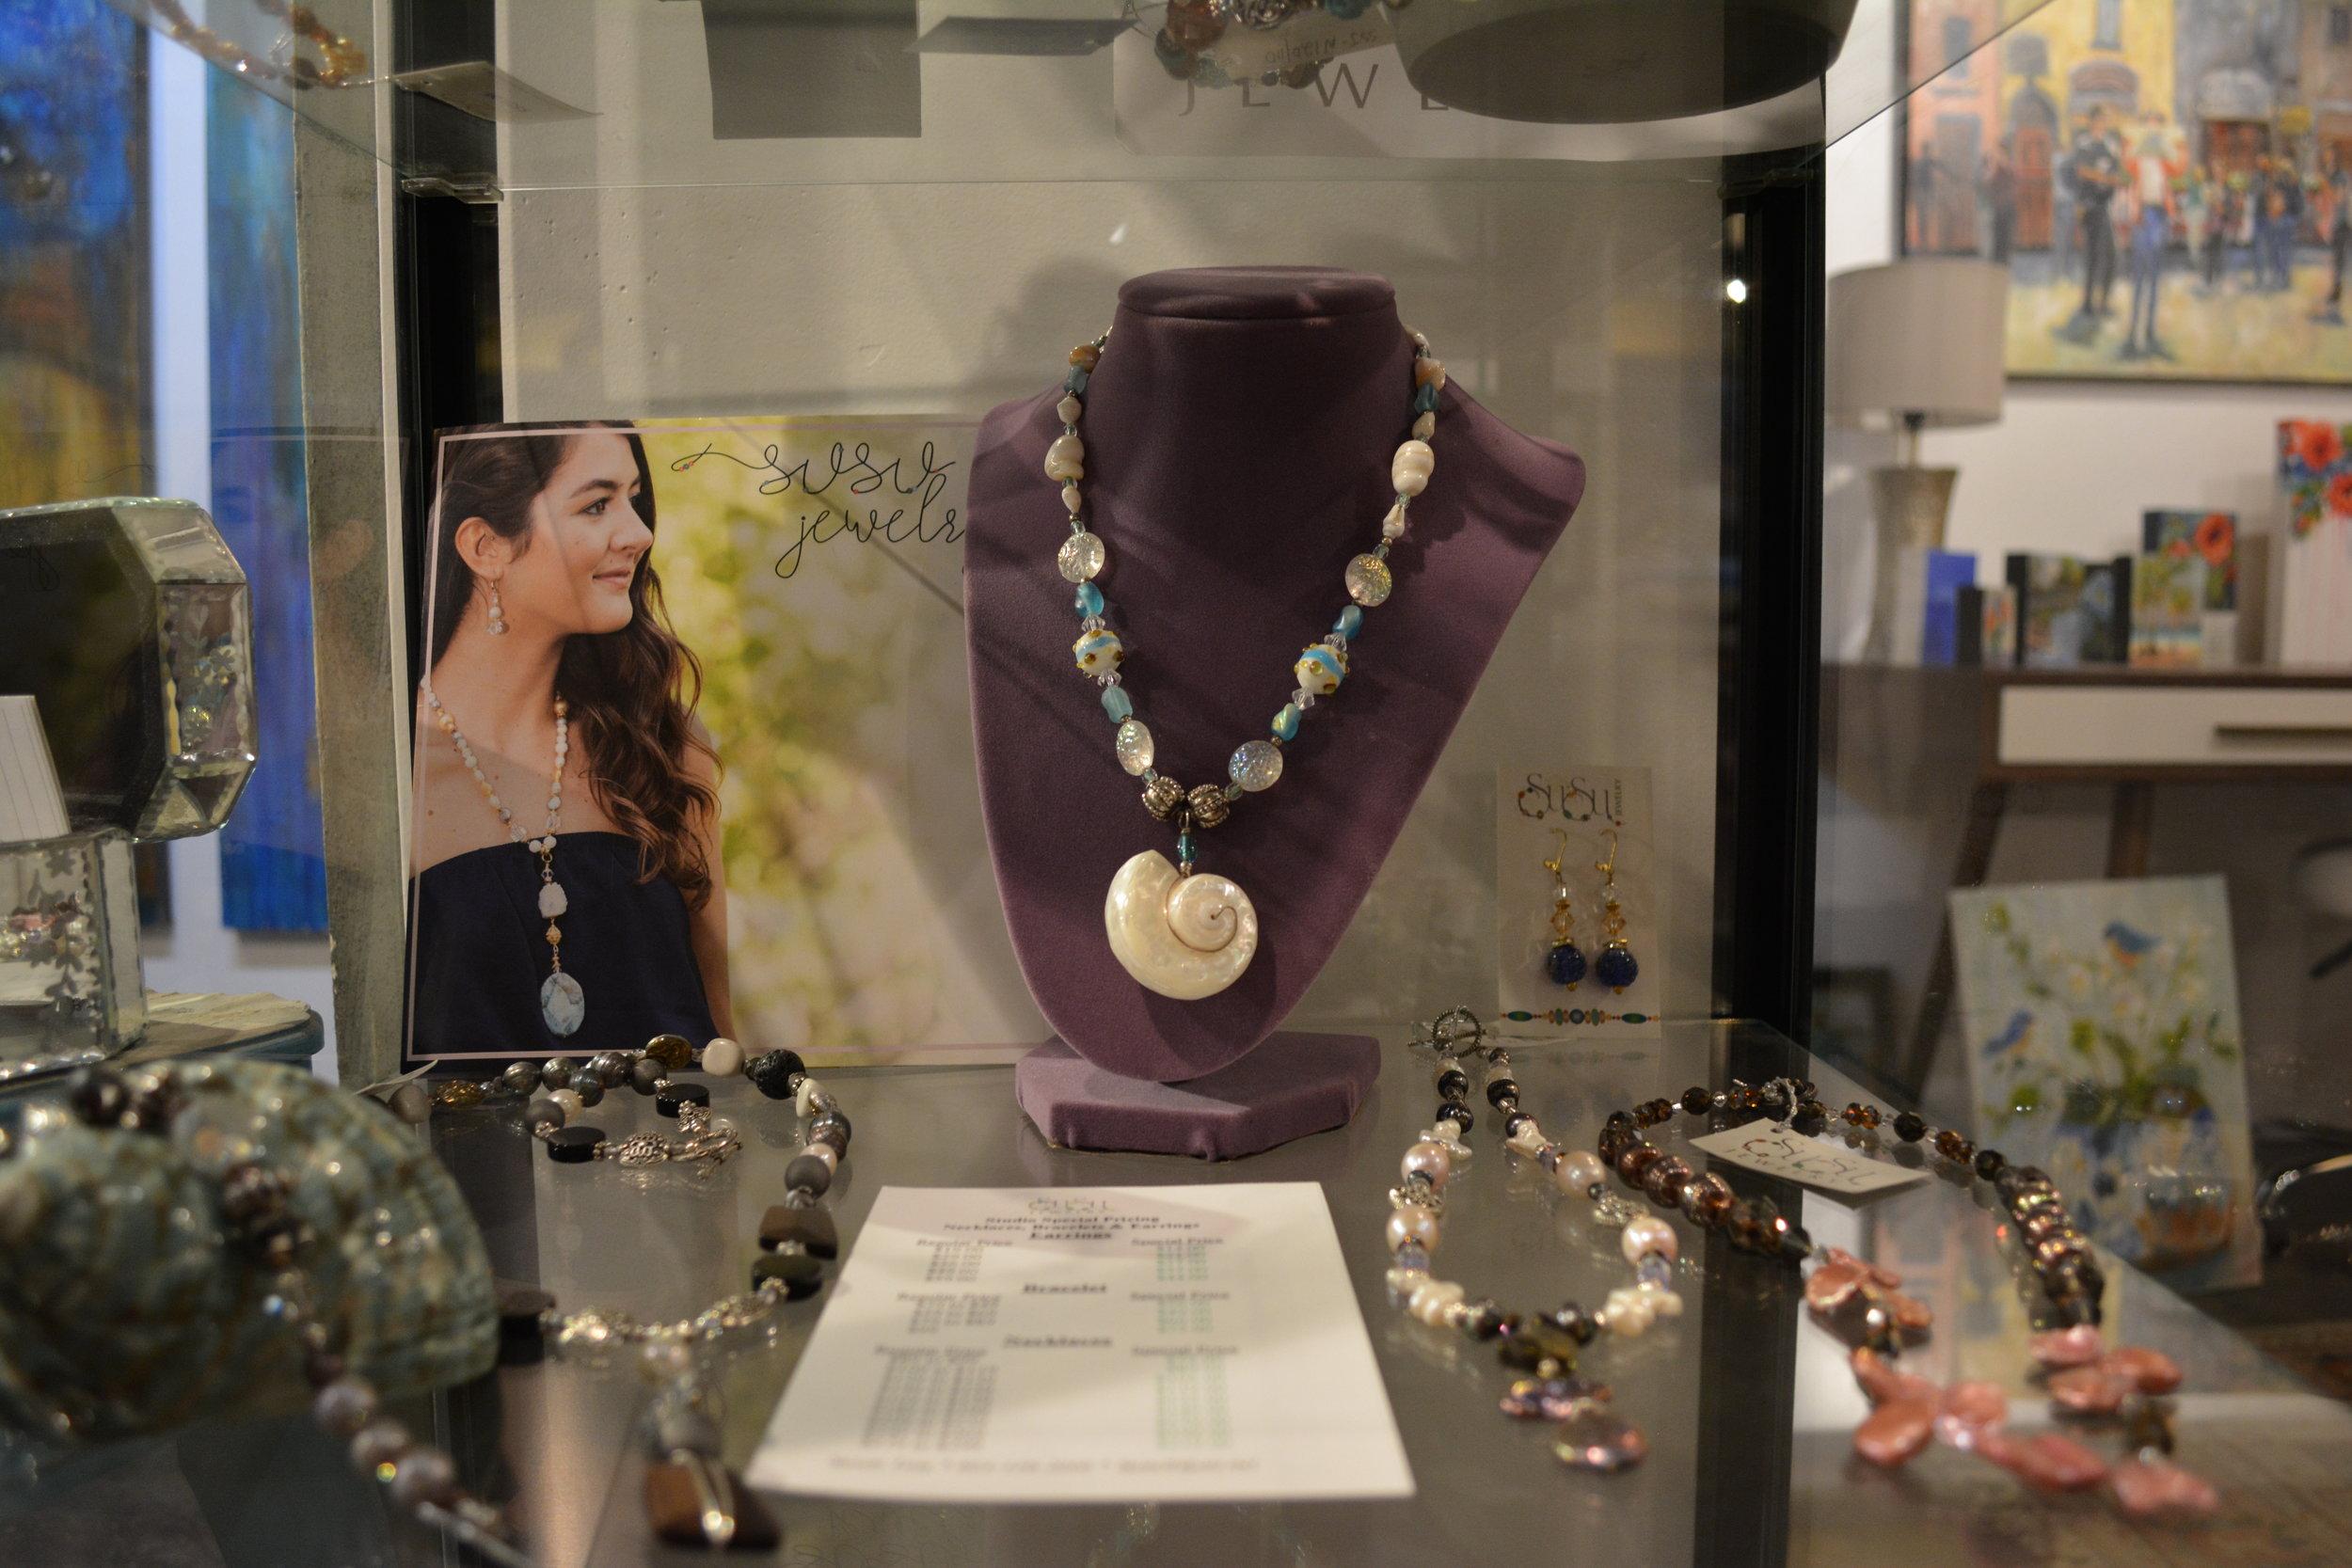 Susan Tate - SuSu Jewelry - Funky Custom and Beadwork Designs